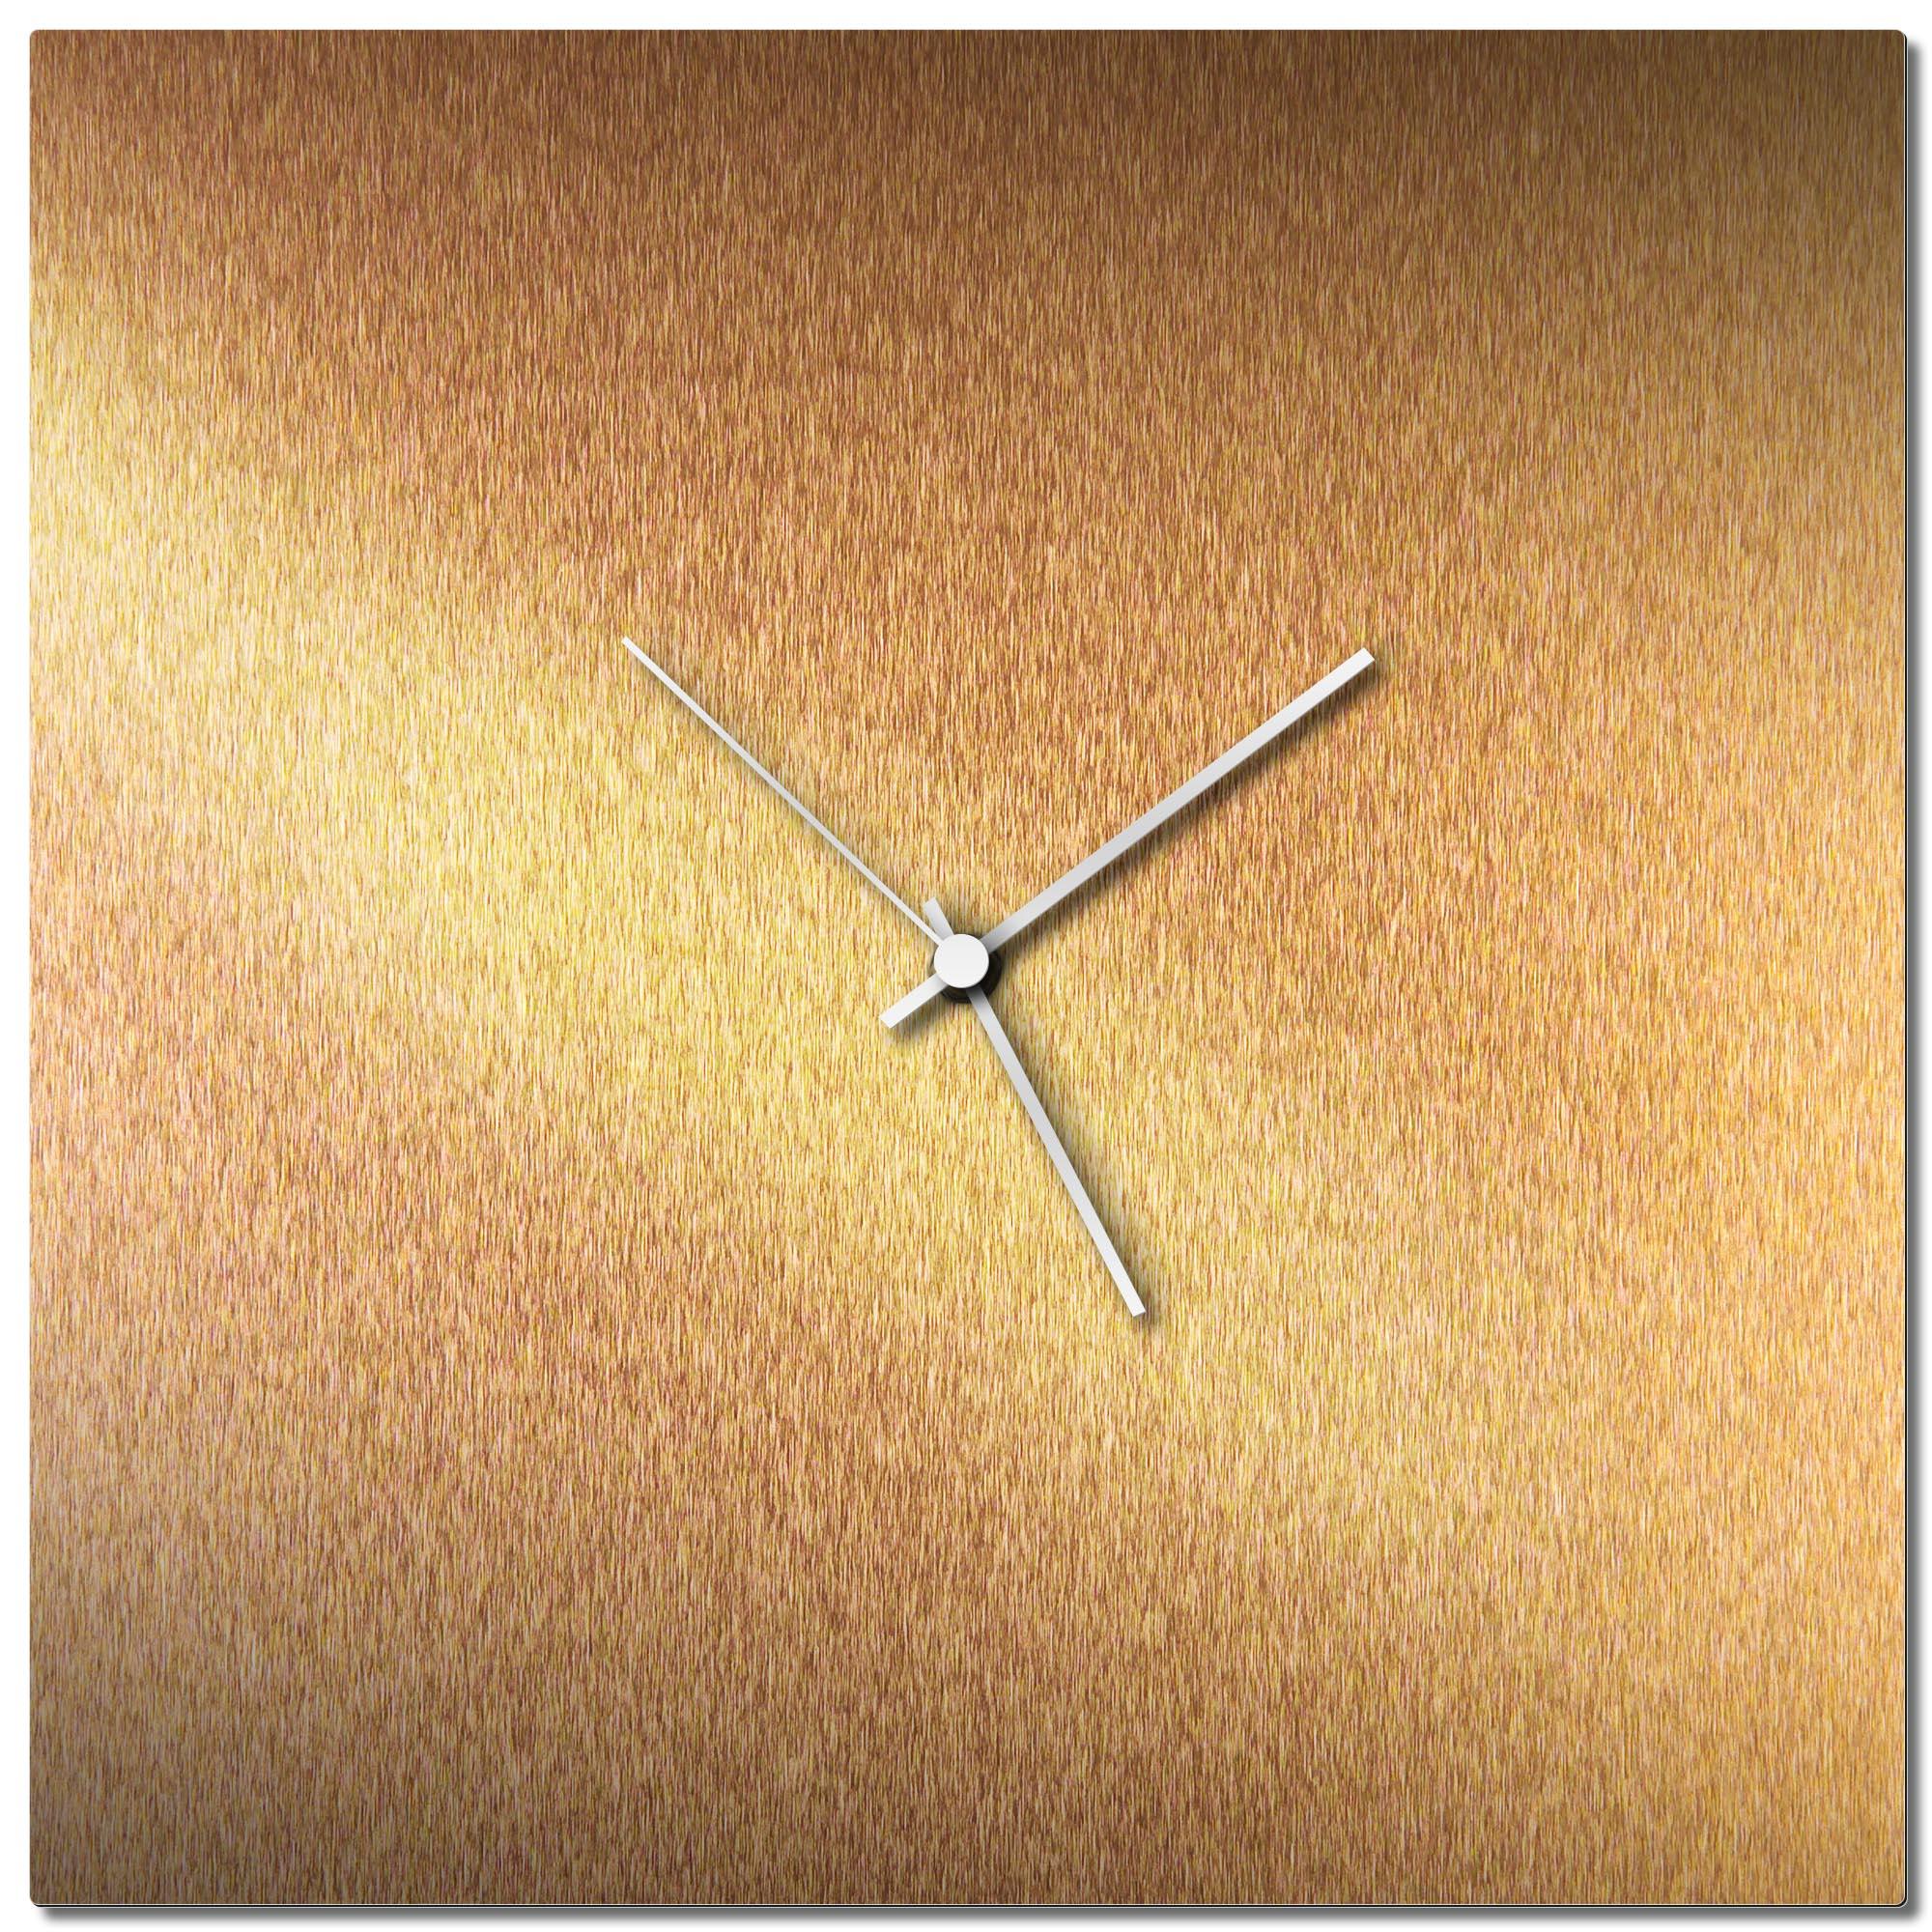 Adam Schwoeppe 'Bronzesmith Square Clock White' Midcentury Modern Style Wall Clock